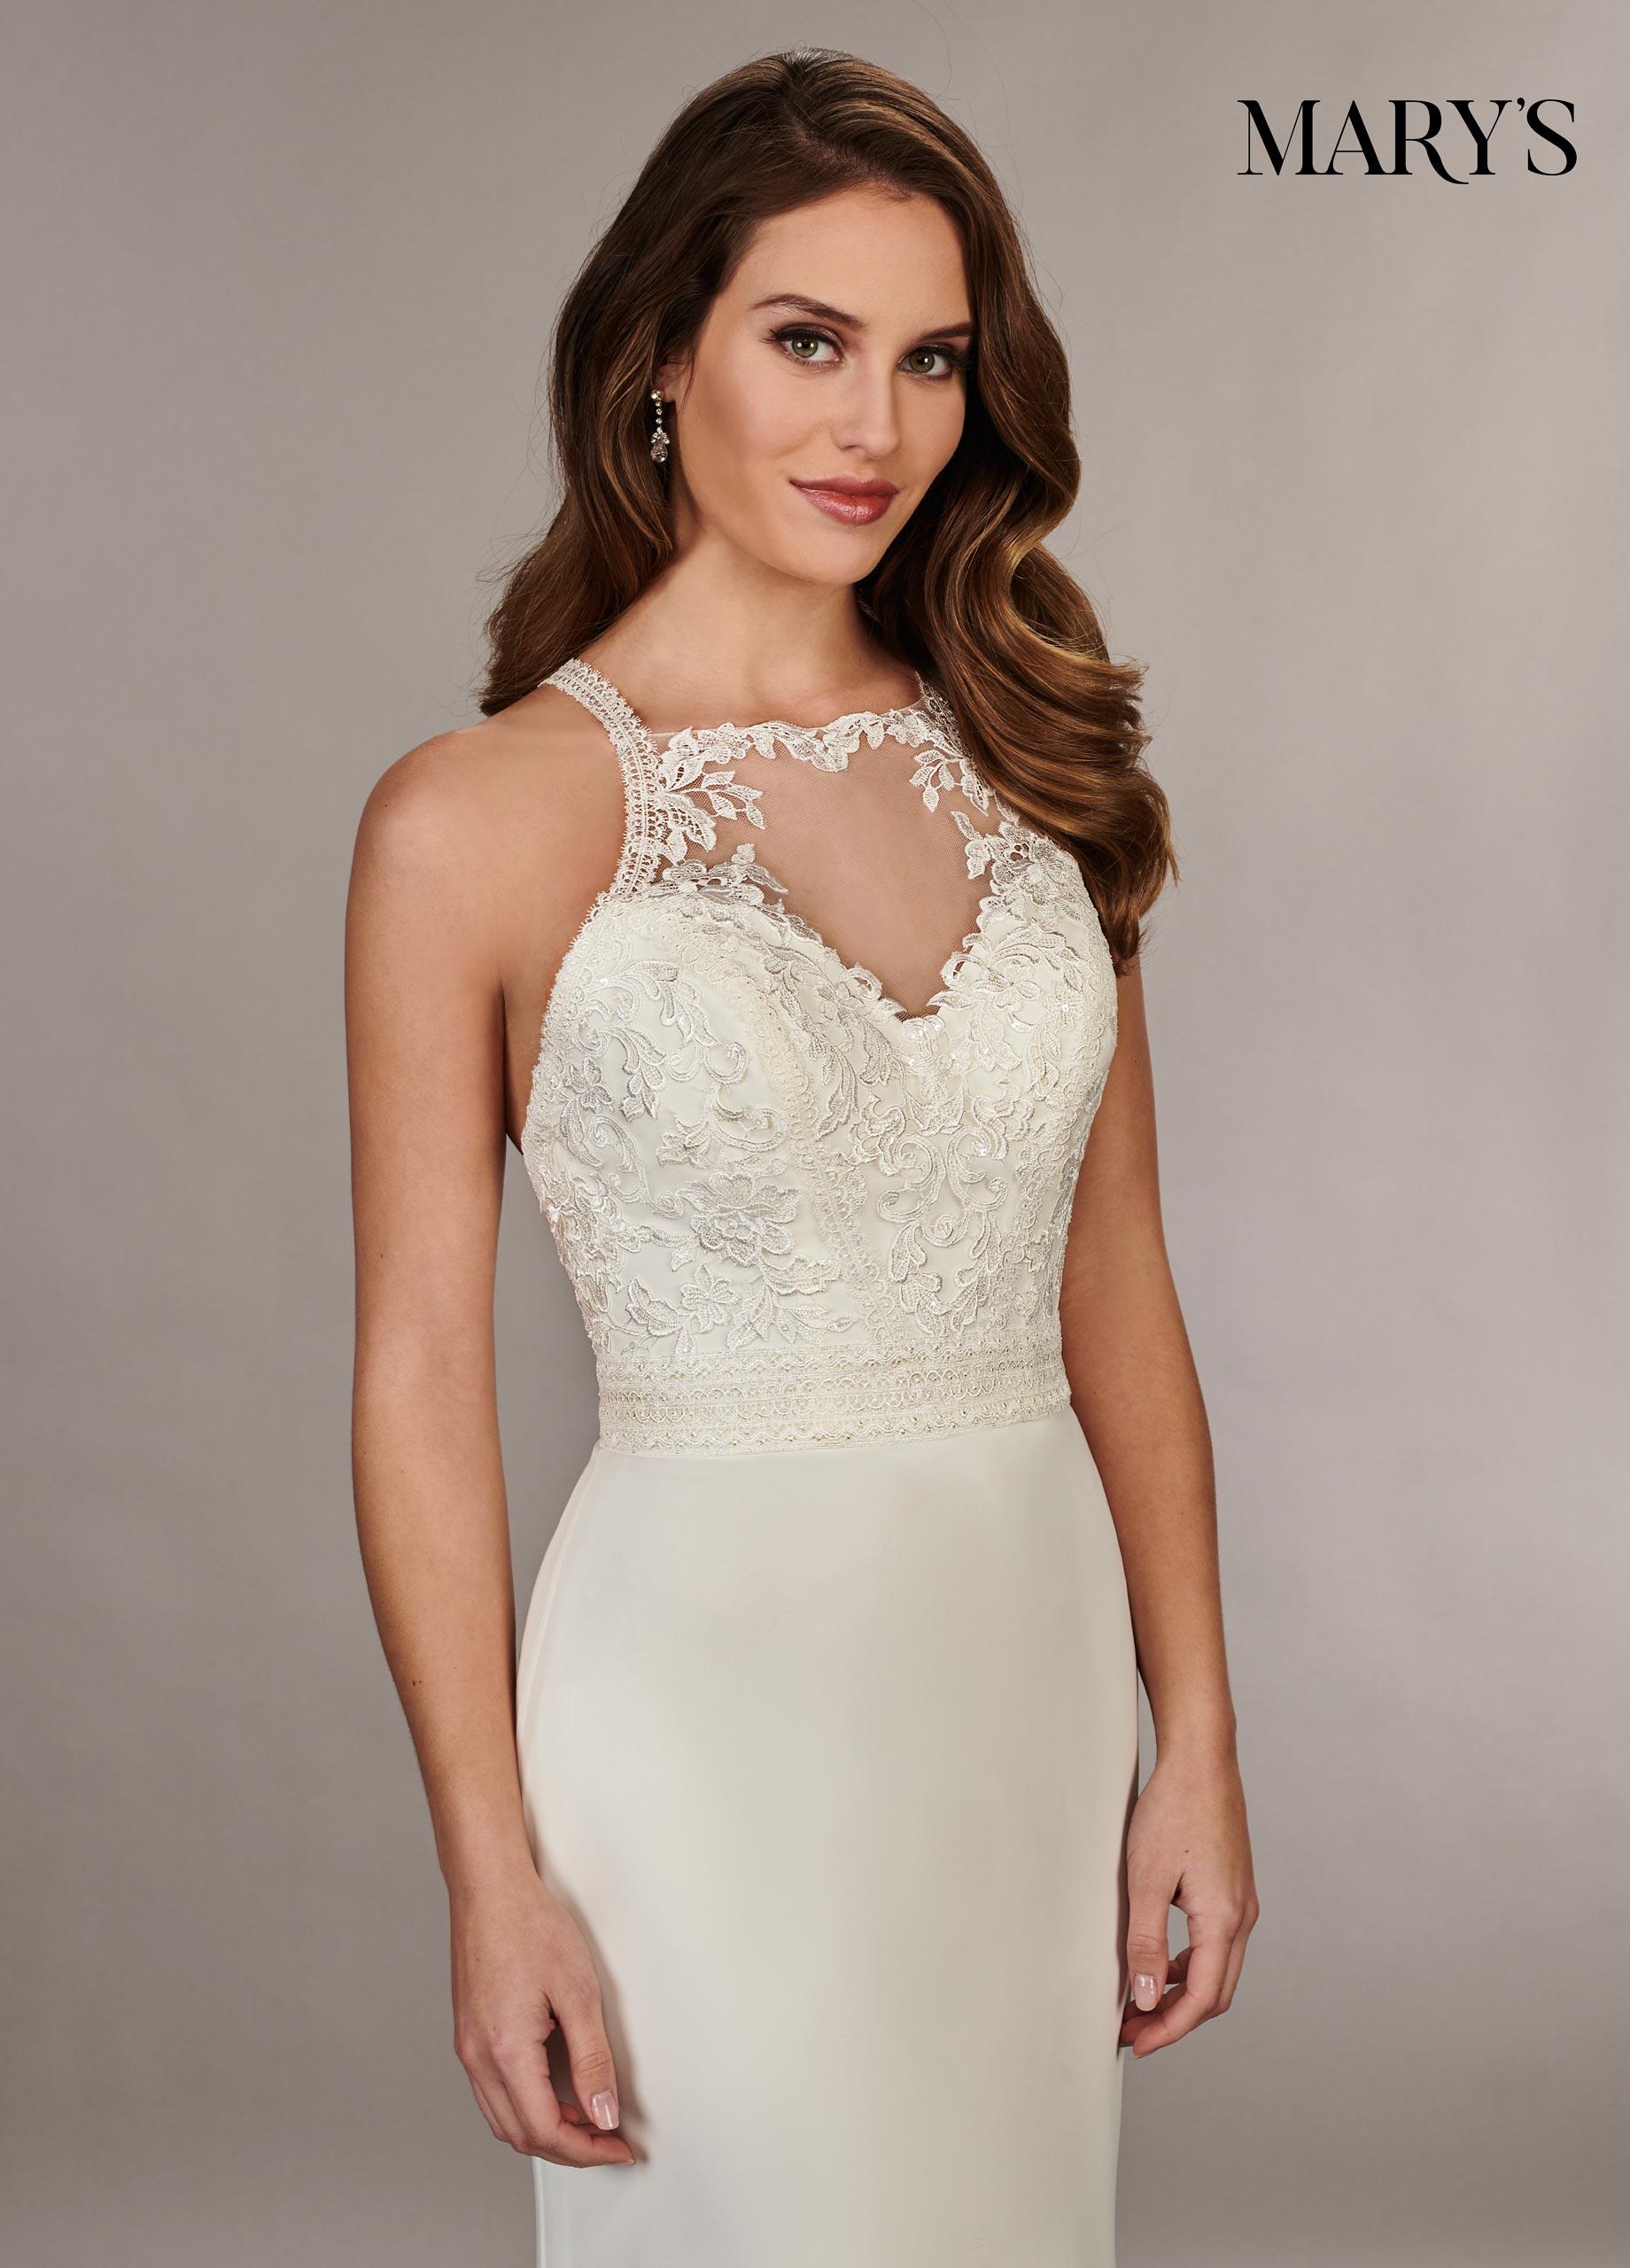 Bridal Wedding Dresses   Mary's   Style - MB1040